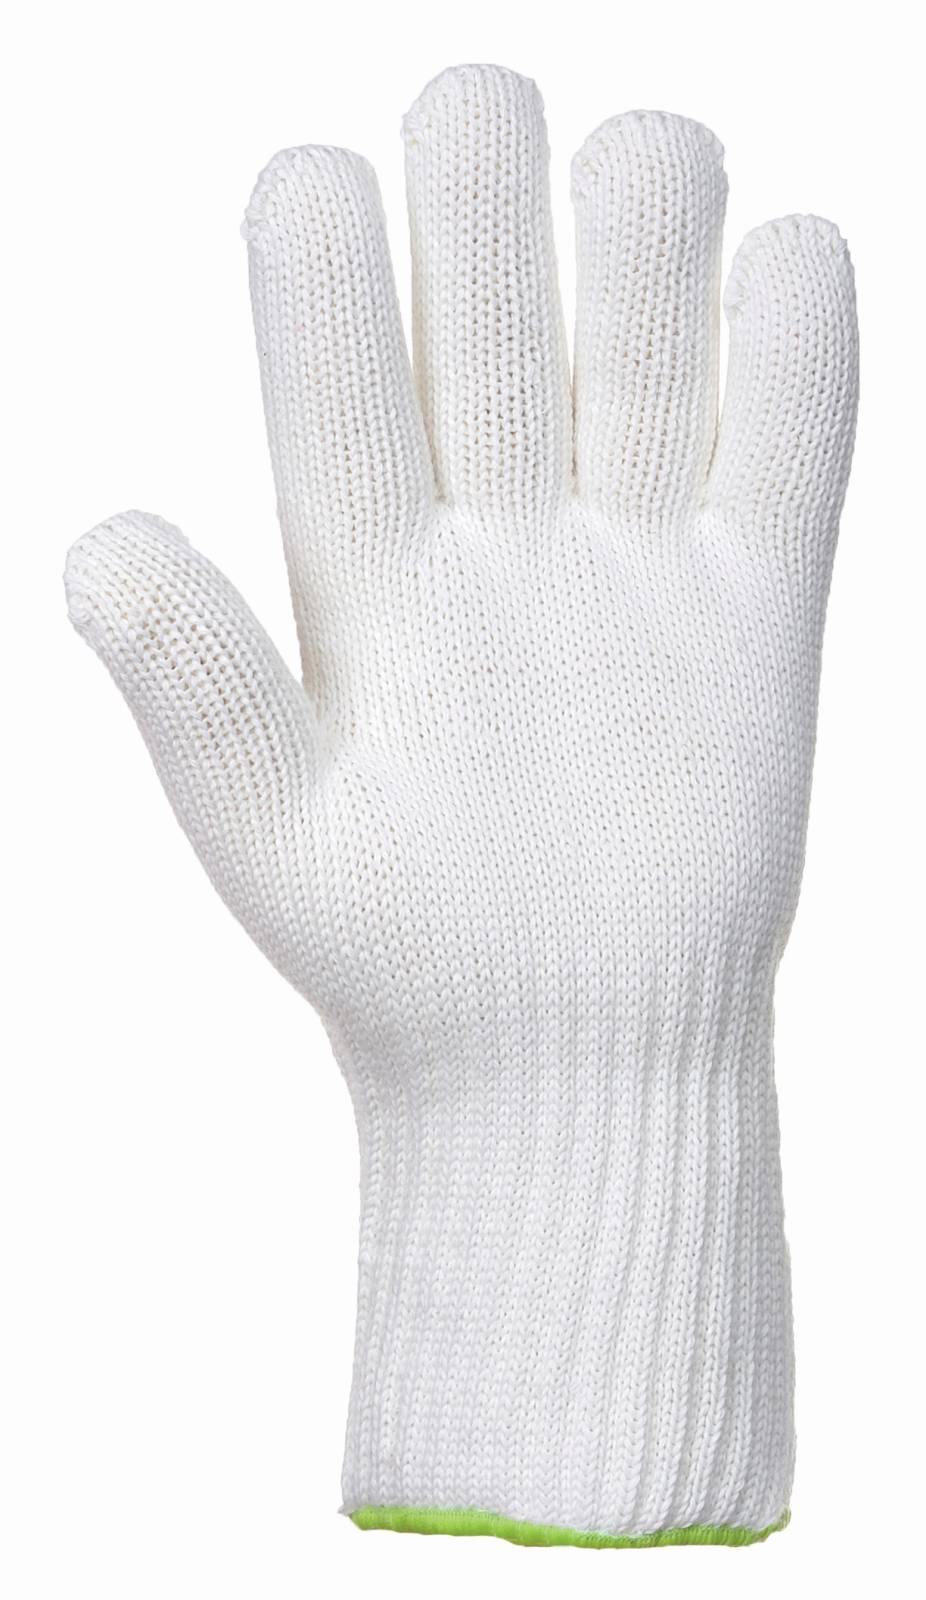 Portwest Handschoenen A590 wit(WH)